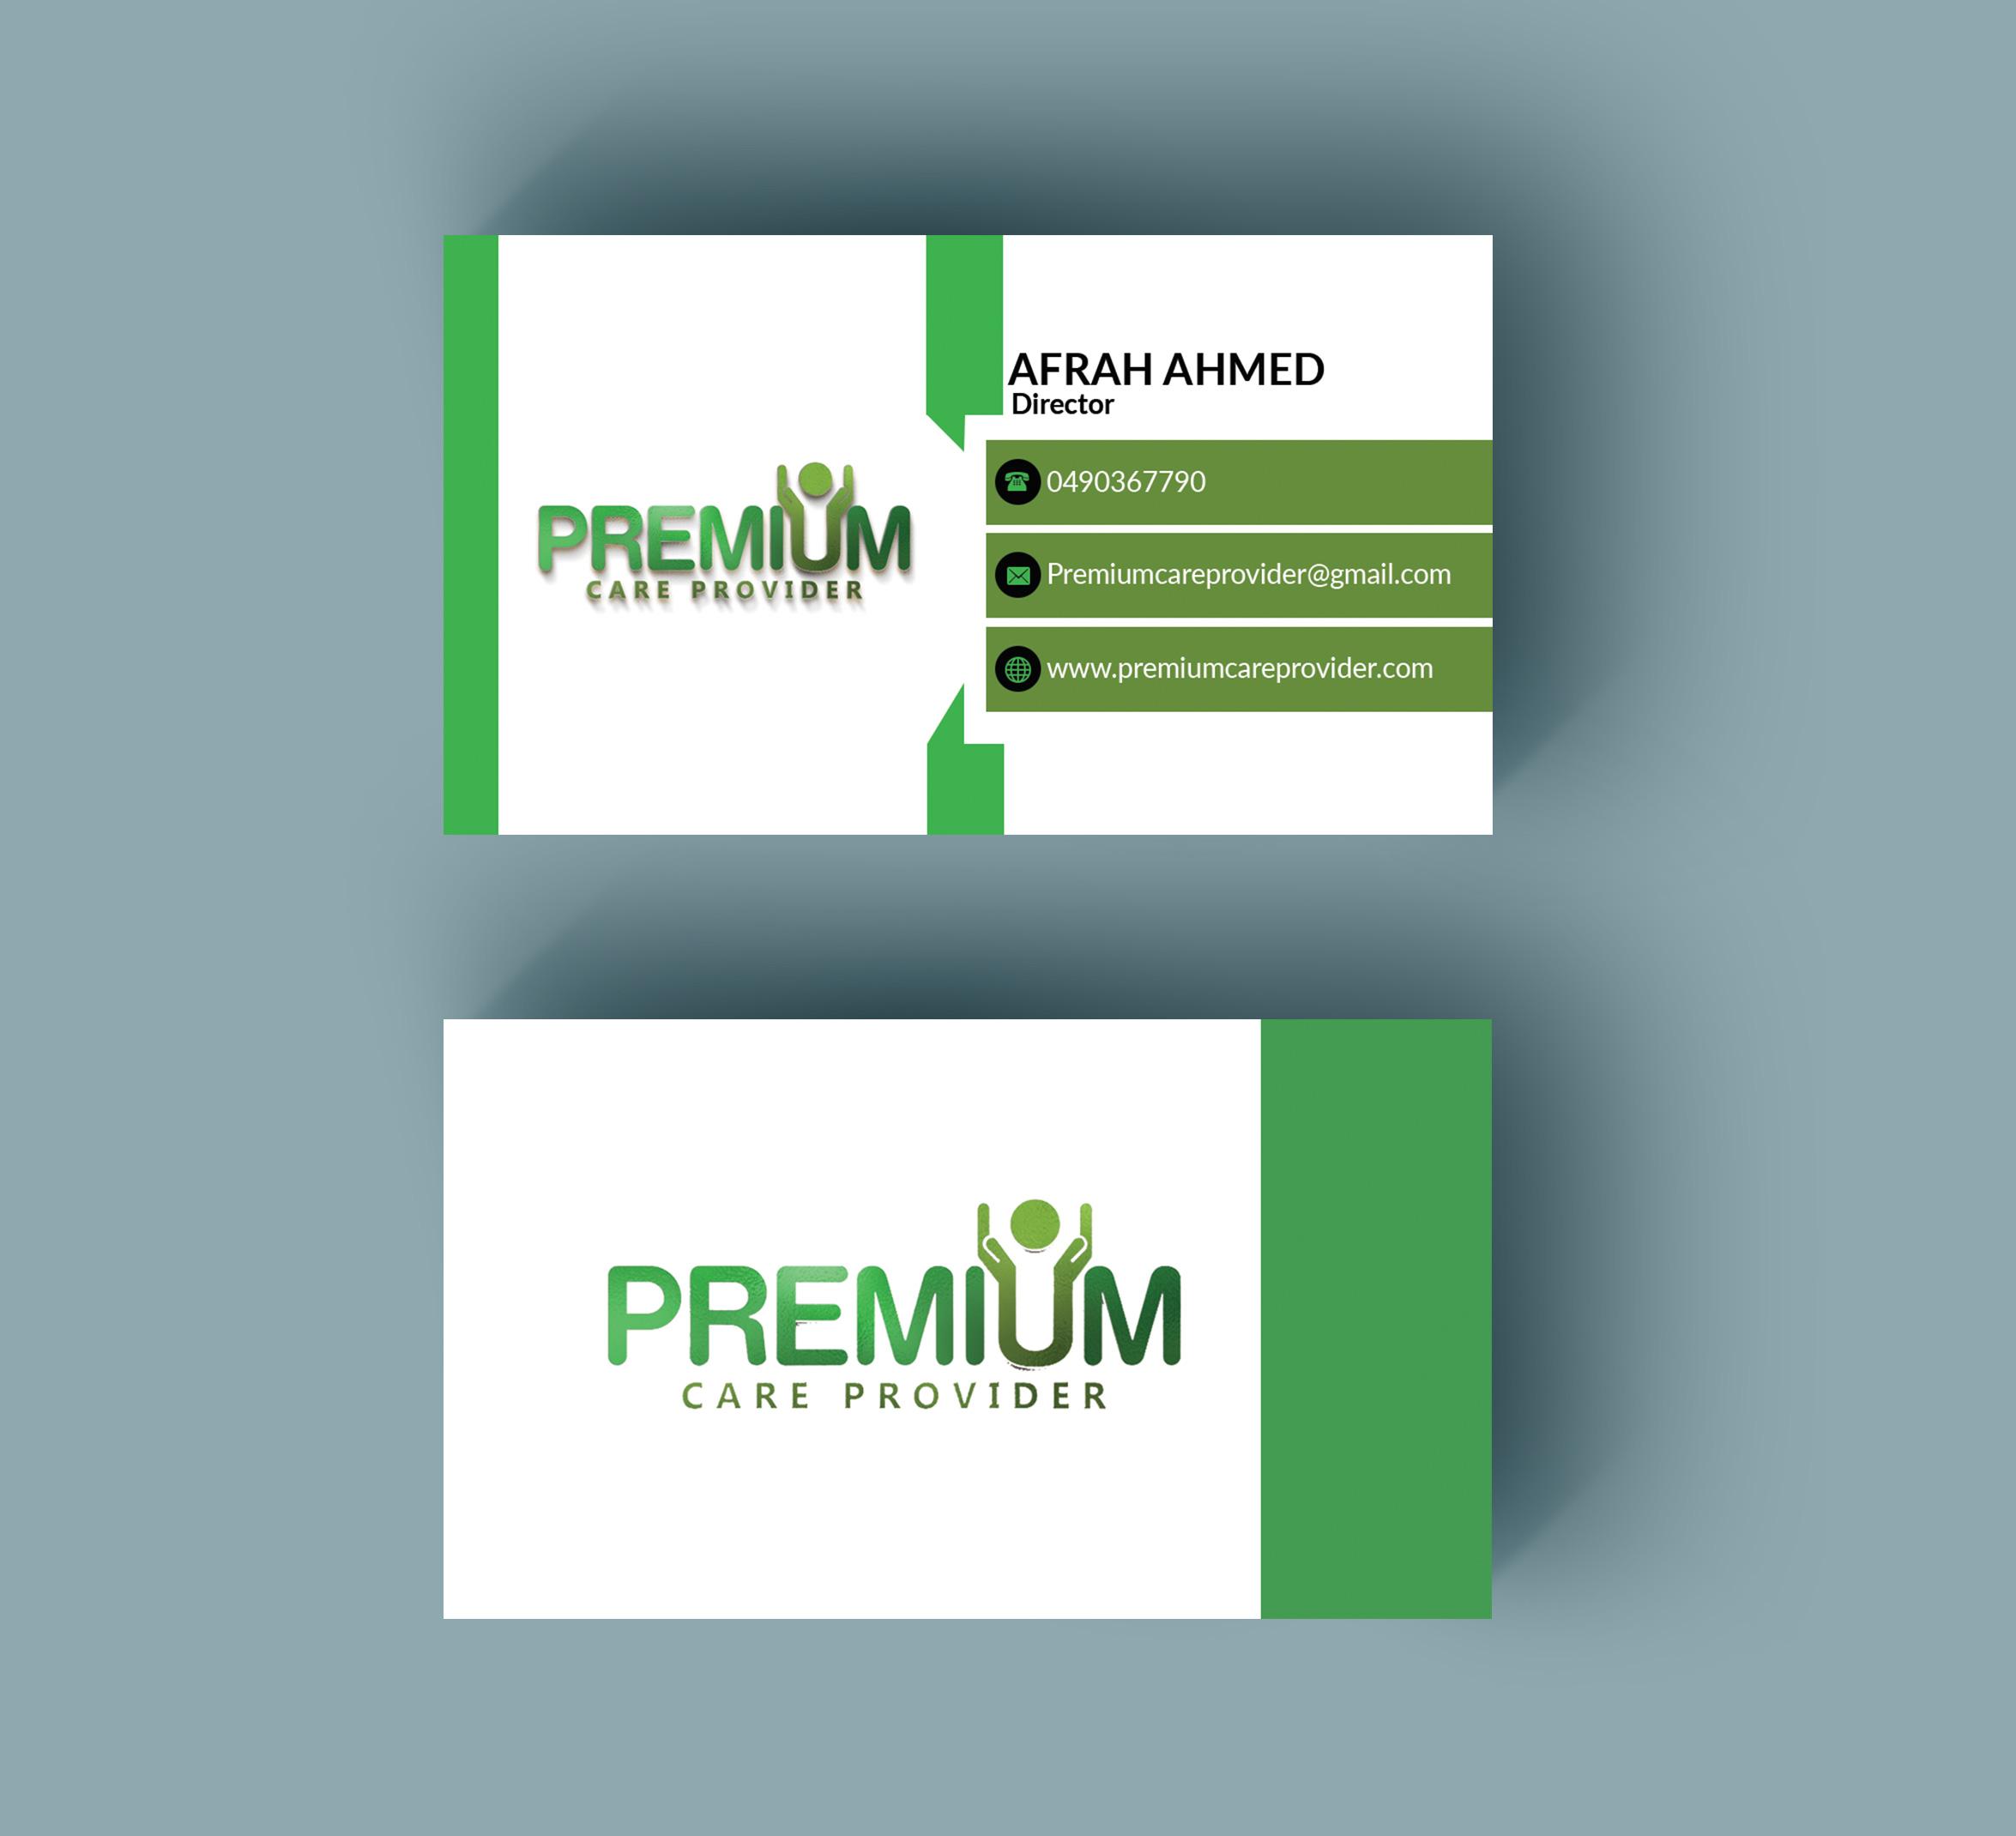 PREMIUM CARE PROVIDER PTY LTD